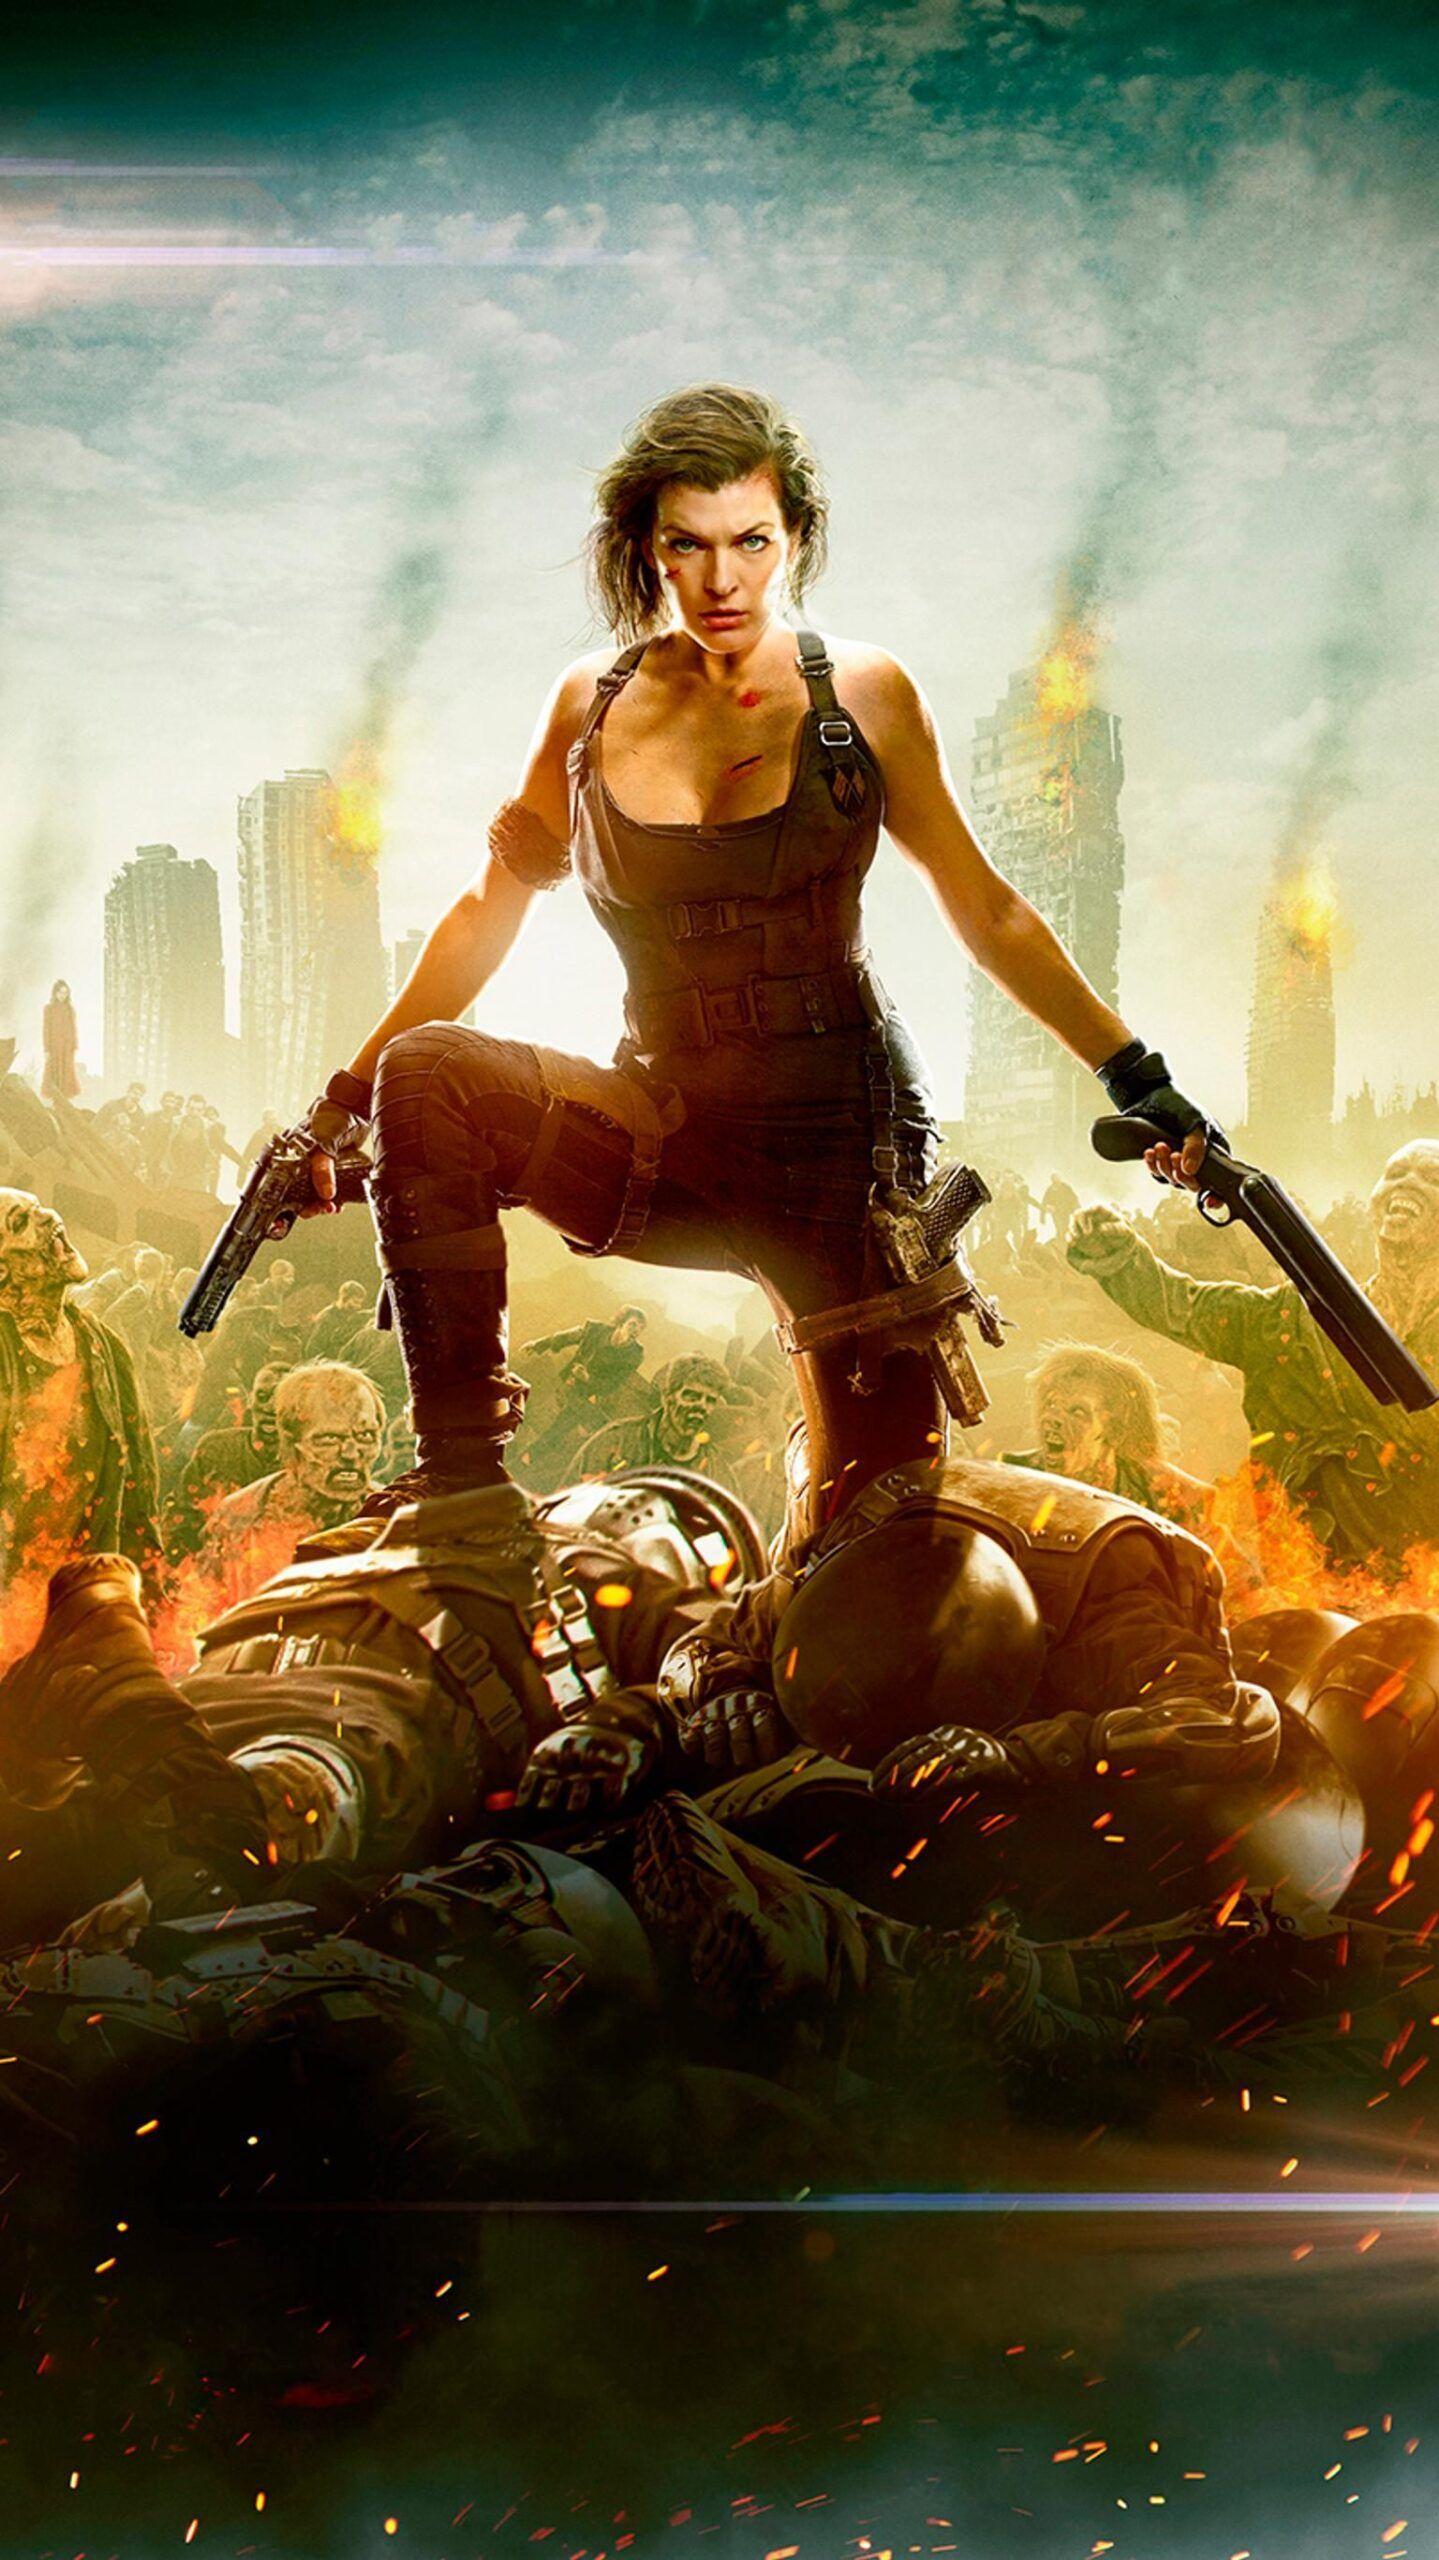 Resident Evil: The Last Chapter (2020) Phone Wallpaper | Movie ...- Resident  Evil: Son Bölüm (2020) Telefon Duvar Kağıdı … em 2020 | Vilãs, Resident evil,  Marvel vingadores